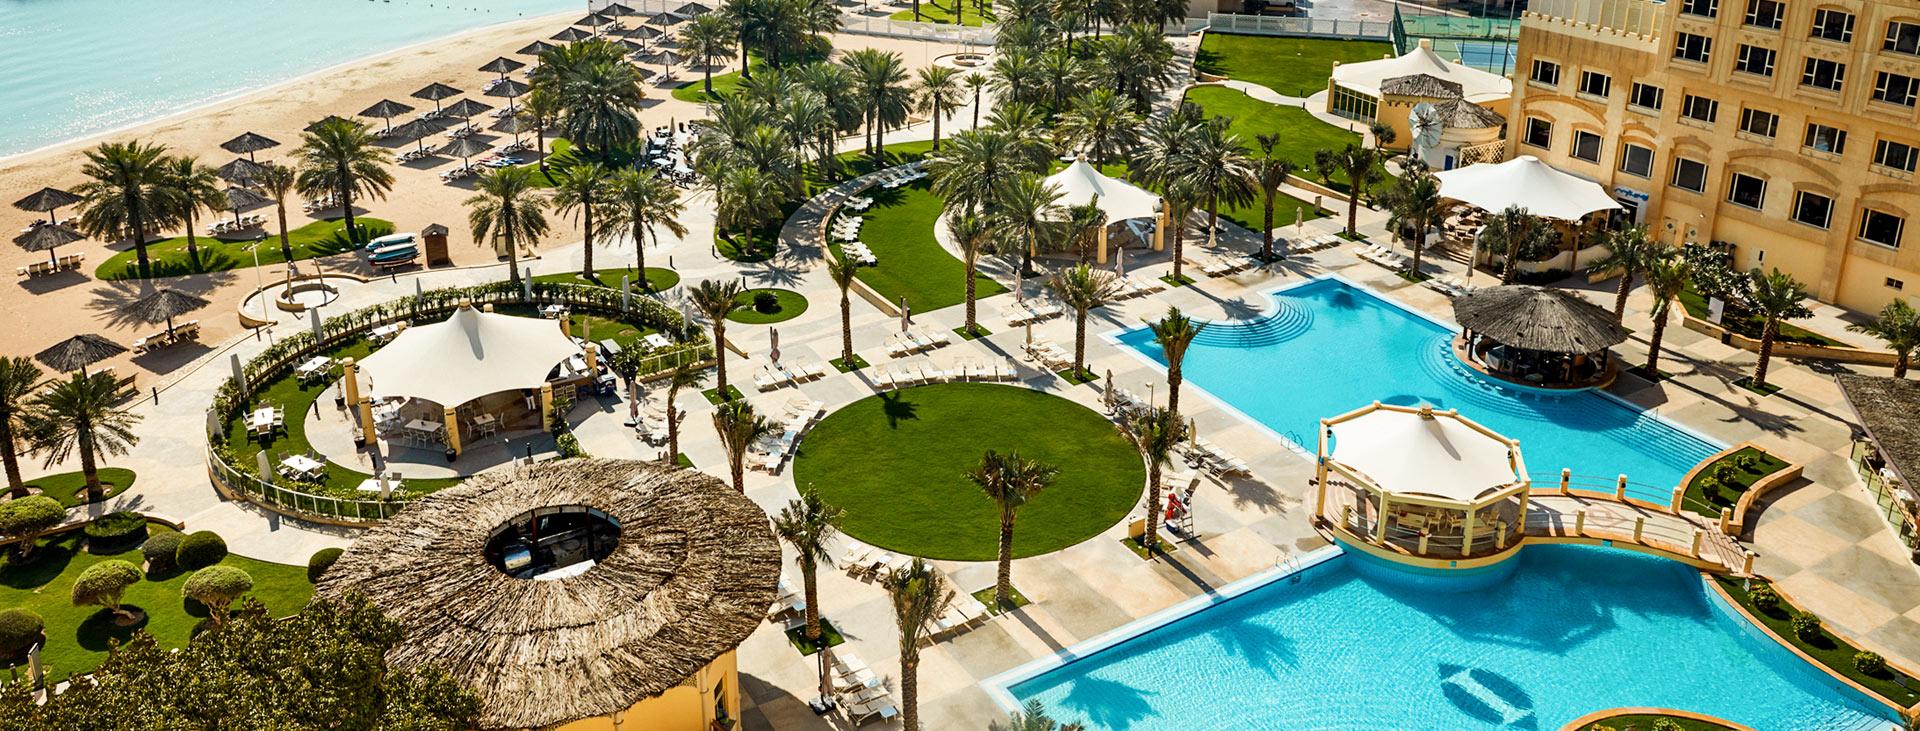 Intercontinental Doha Beach, Doha, Qatar